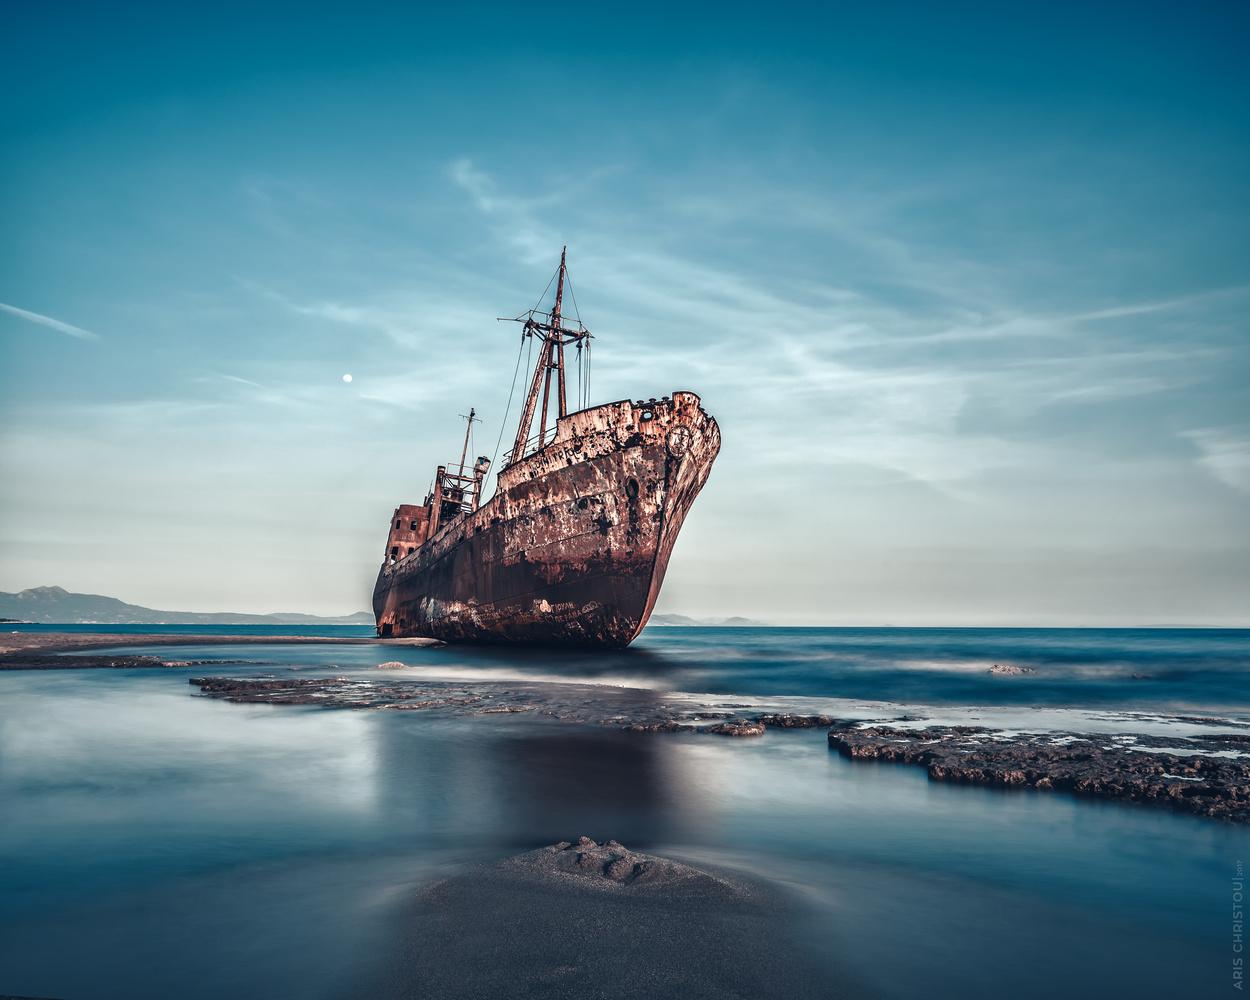 Dimitrios Shipwreck | Gytheio, Greece by Aris Christou